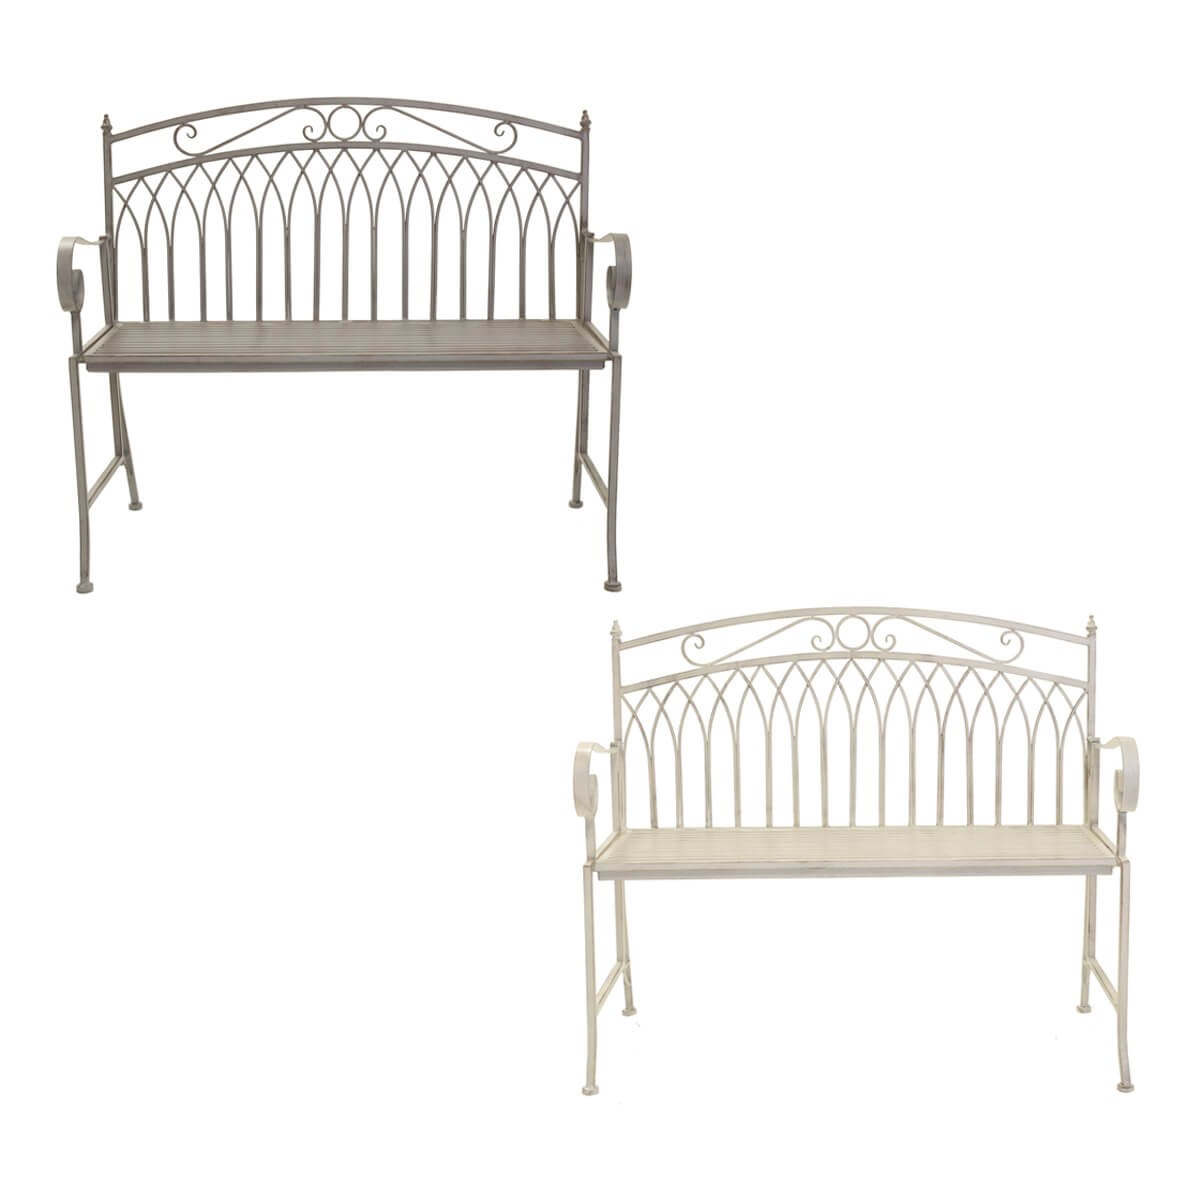 Wrought Iron Garden Bench Grey or White